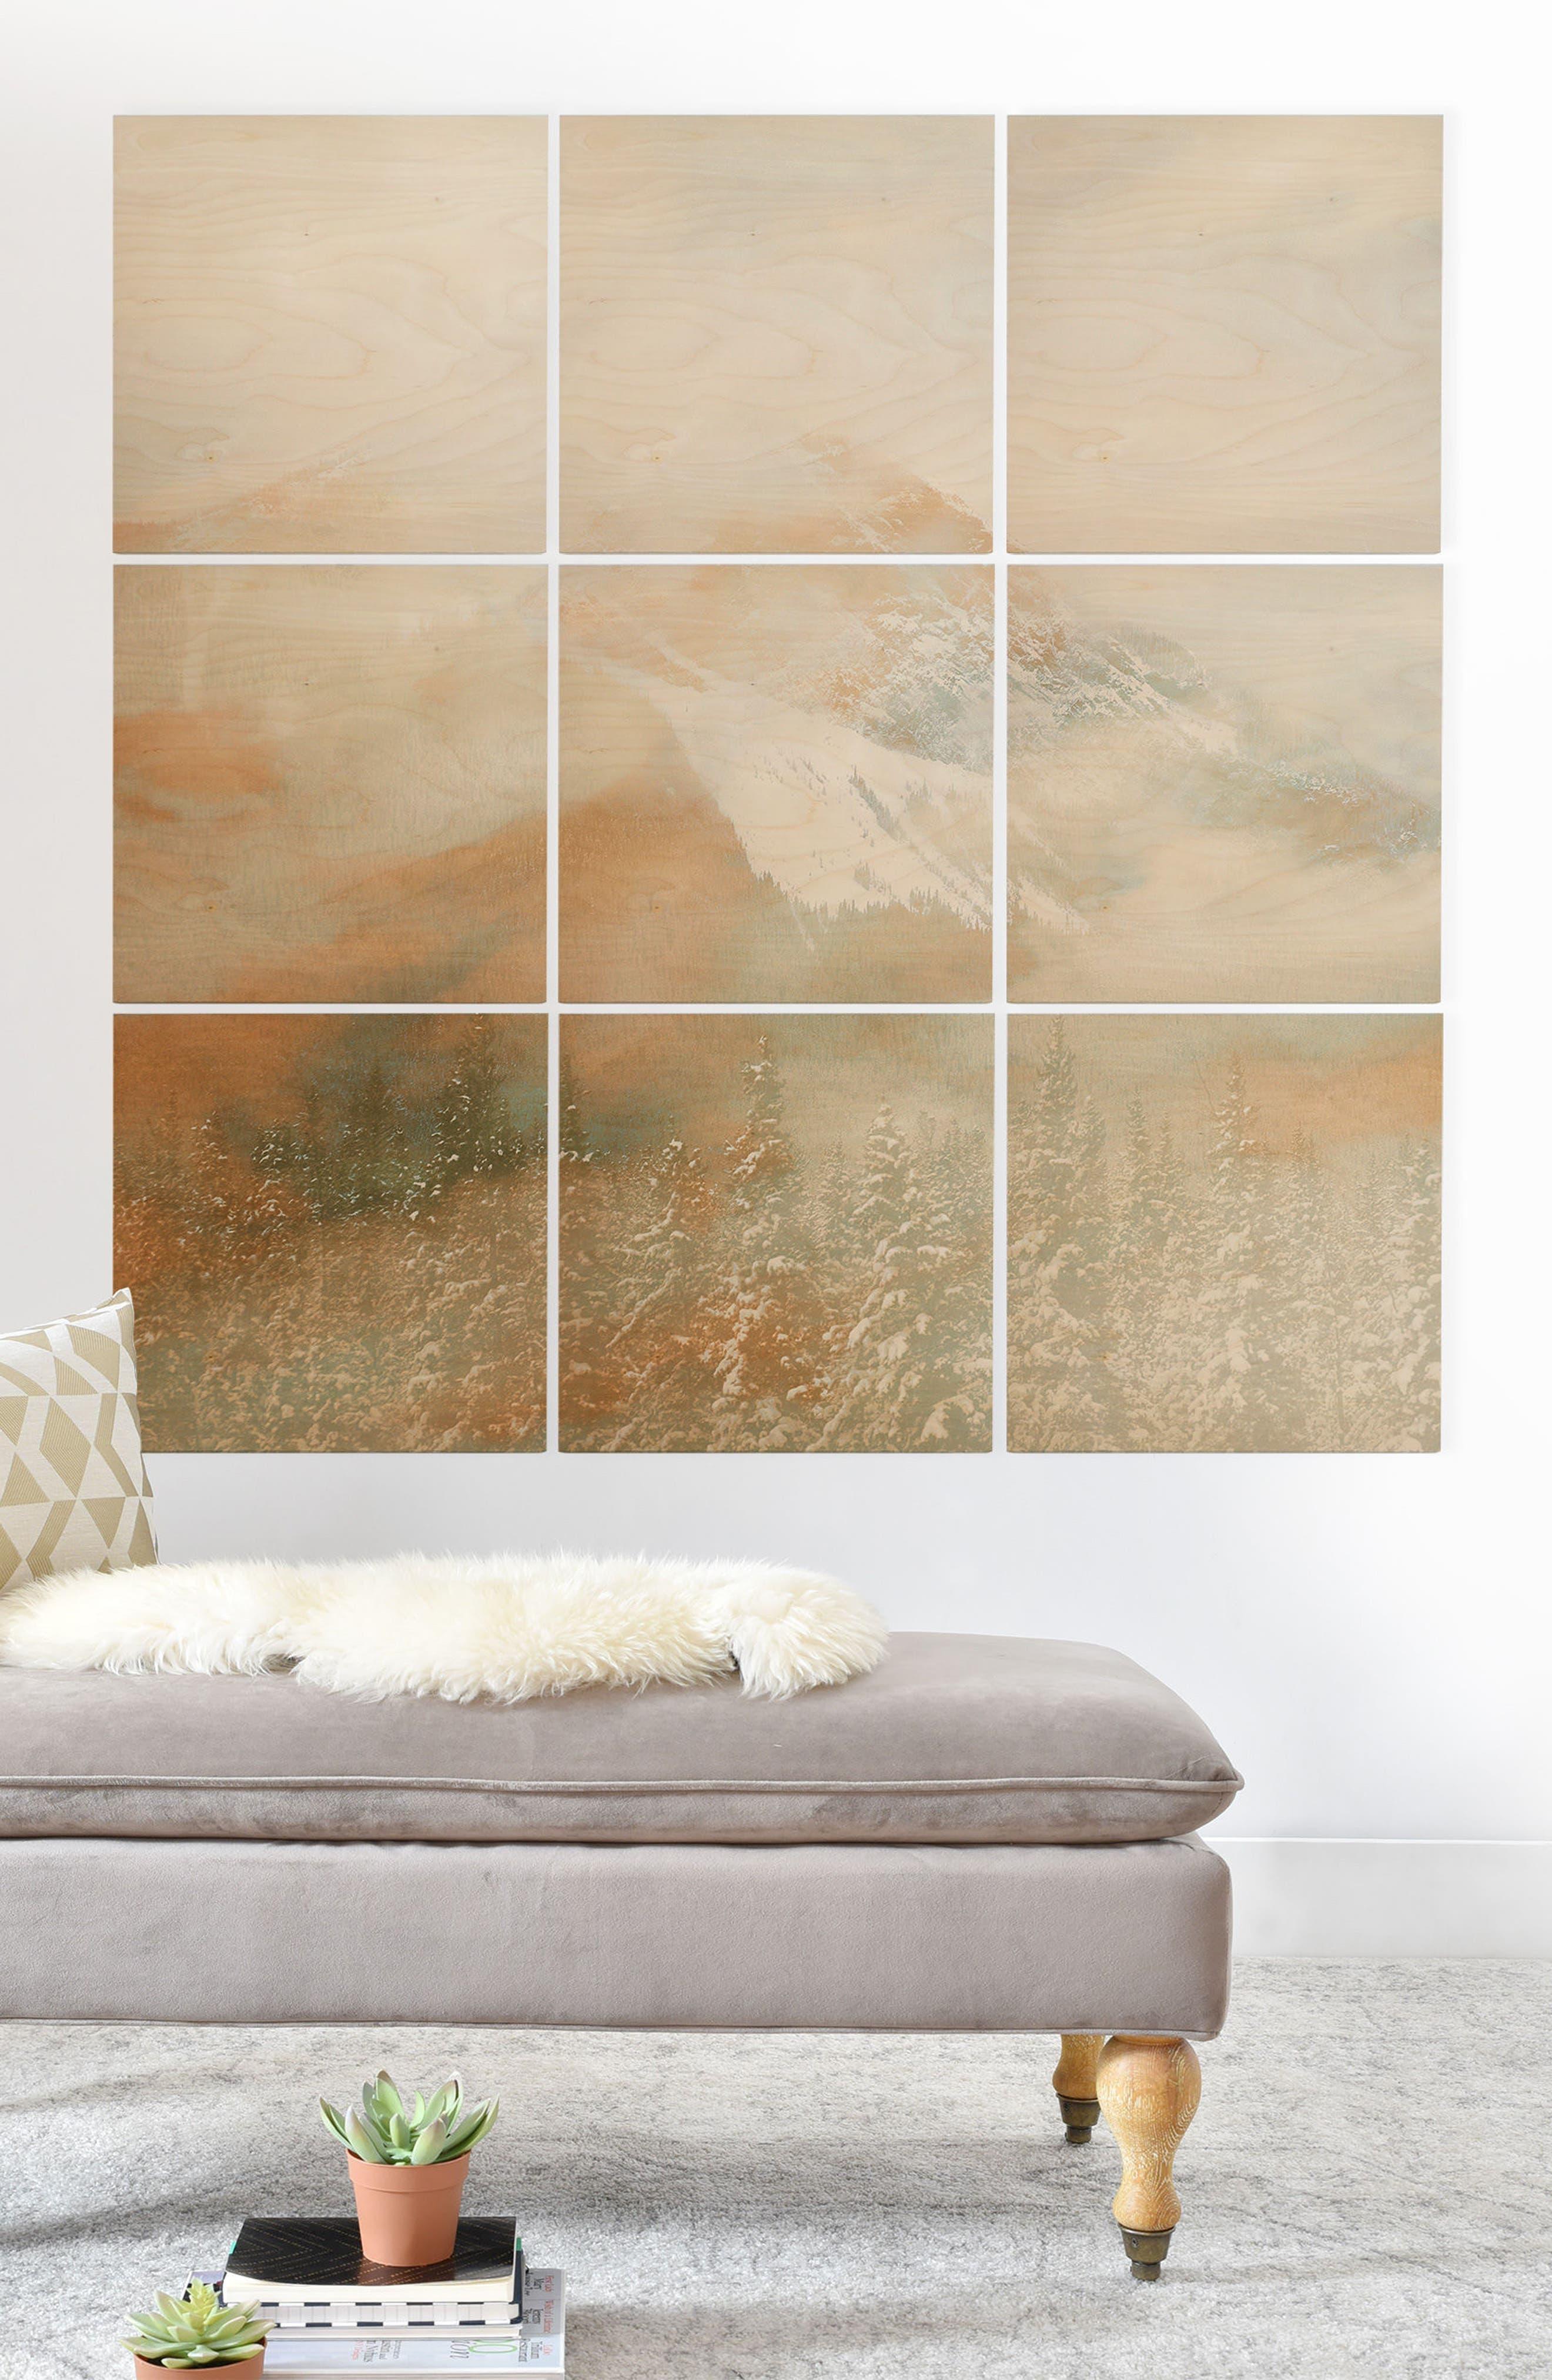 Golden Banff 9-Piece Wood Wall Mural,                             Alternate thumbnail 2, color,                             GRAY/ GOLD